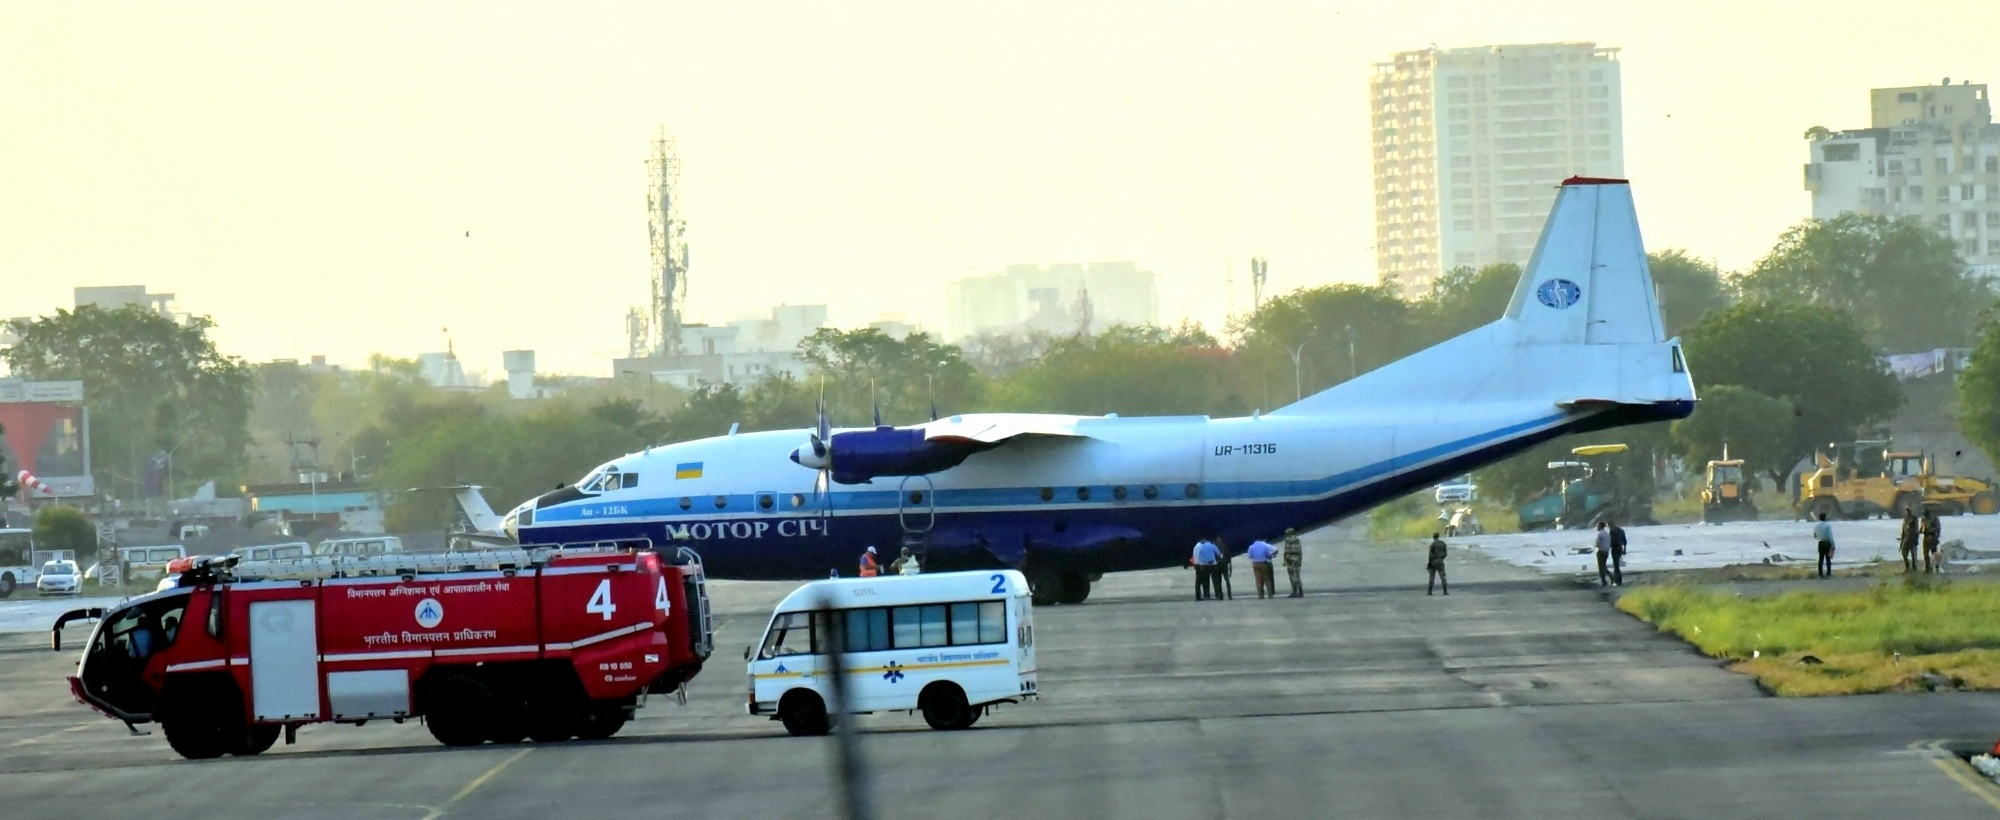 Indian Air Force, Jaipur, airport, Indian air space, Georgian An-12 cargo aircraft, National news